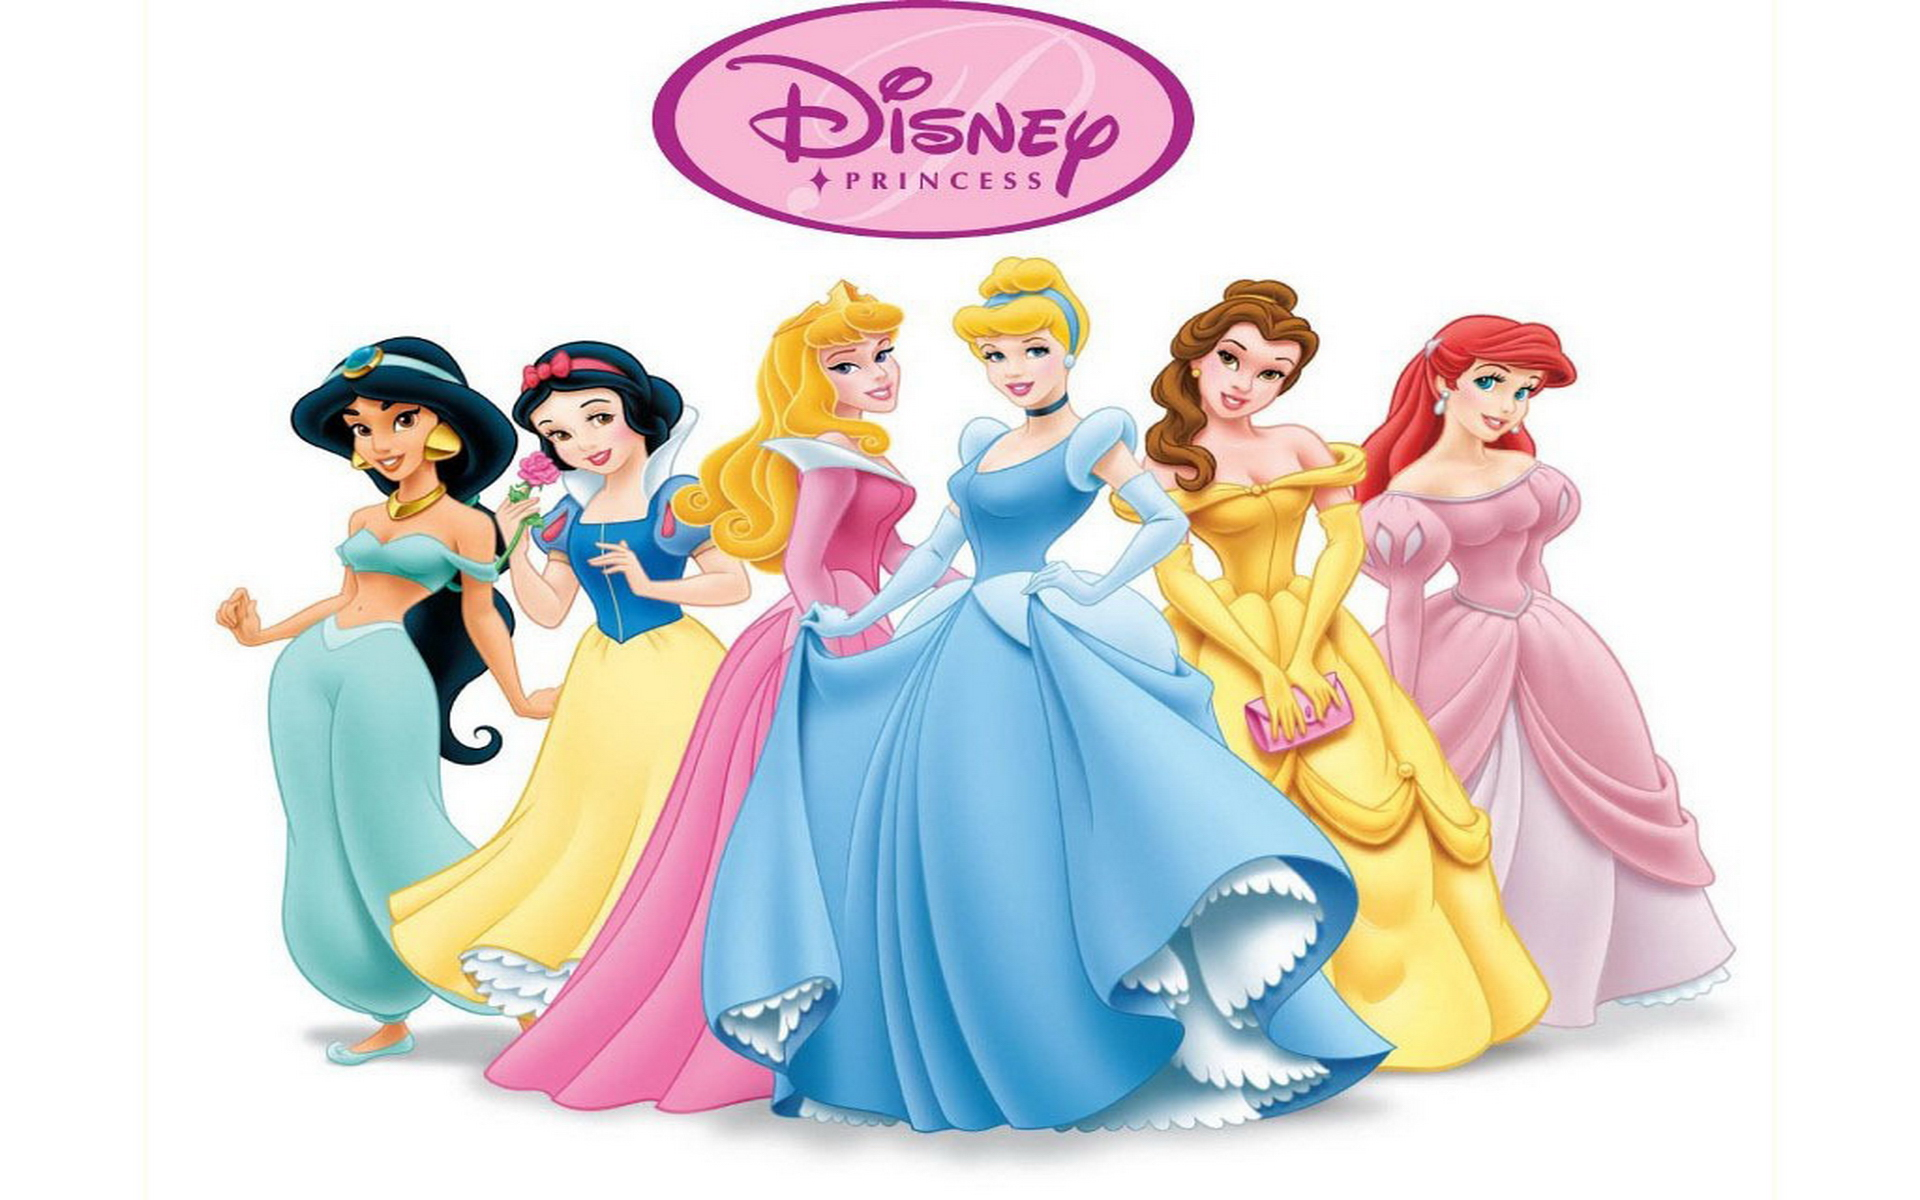 Princesas disney hd wallpaper altavistaventures Choice Image